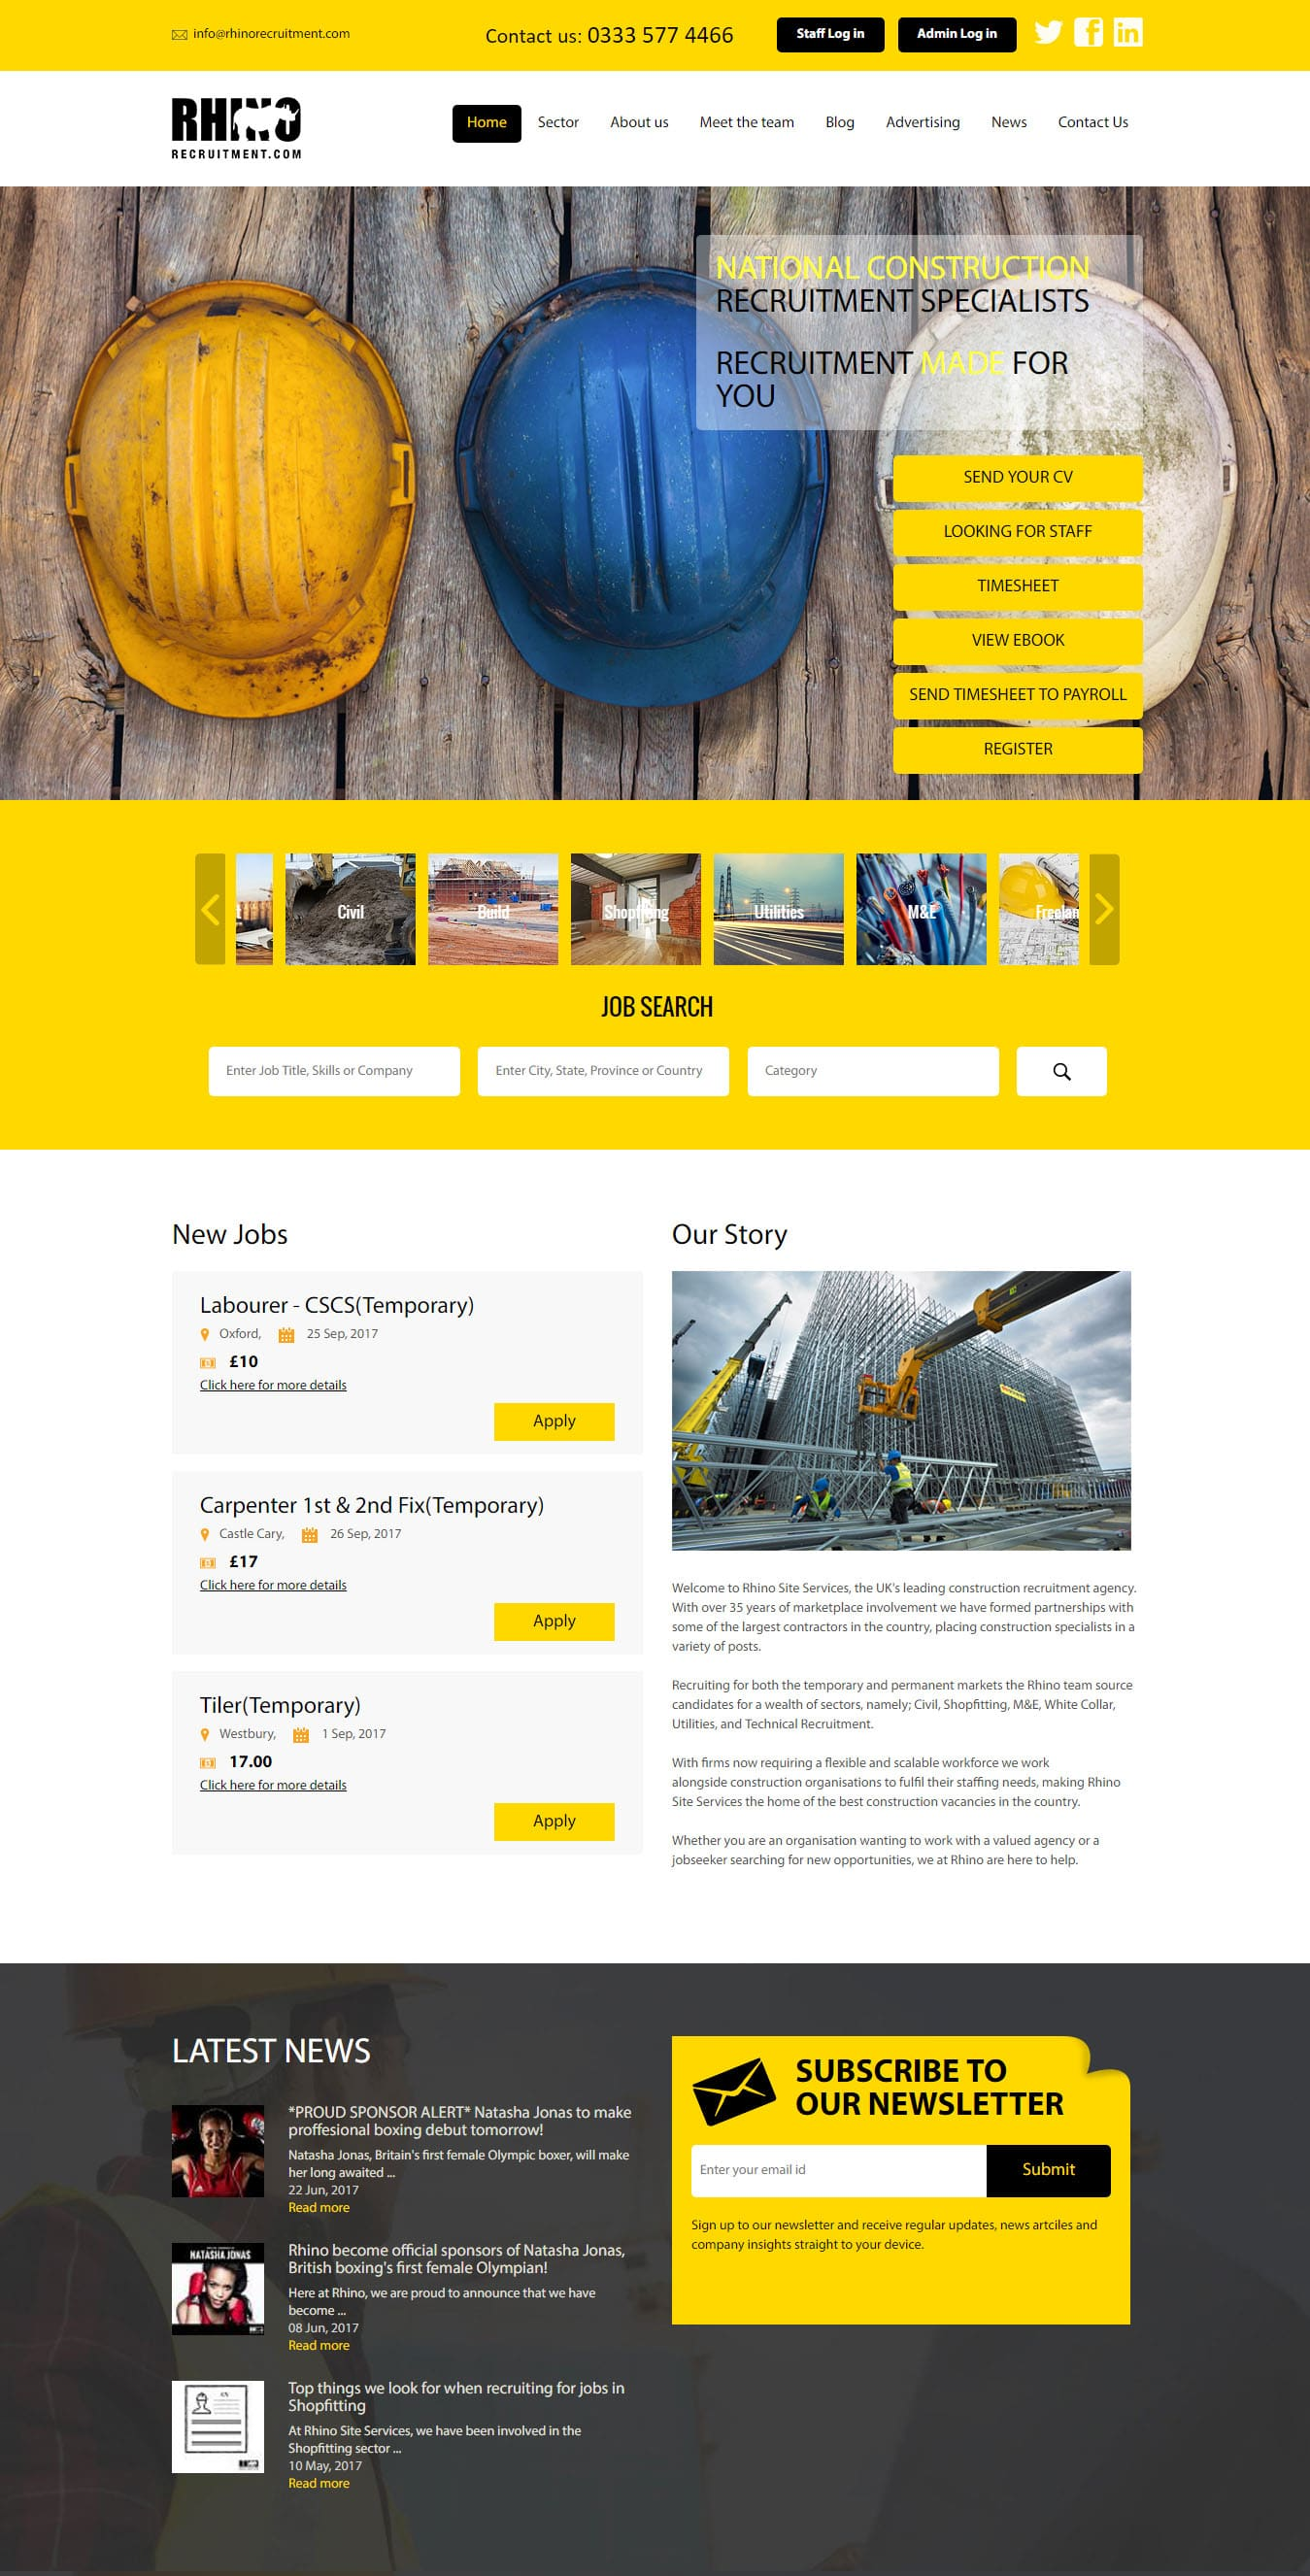 Rhino: Leading Recruitment Agency Web Application